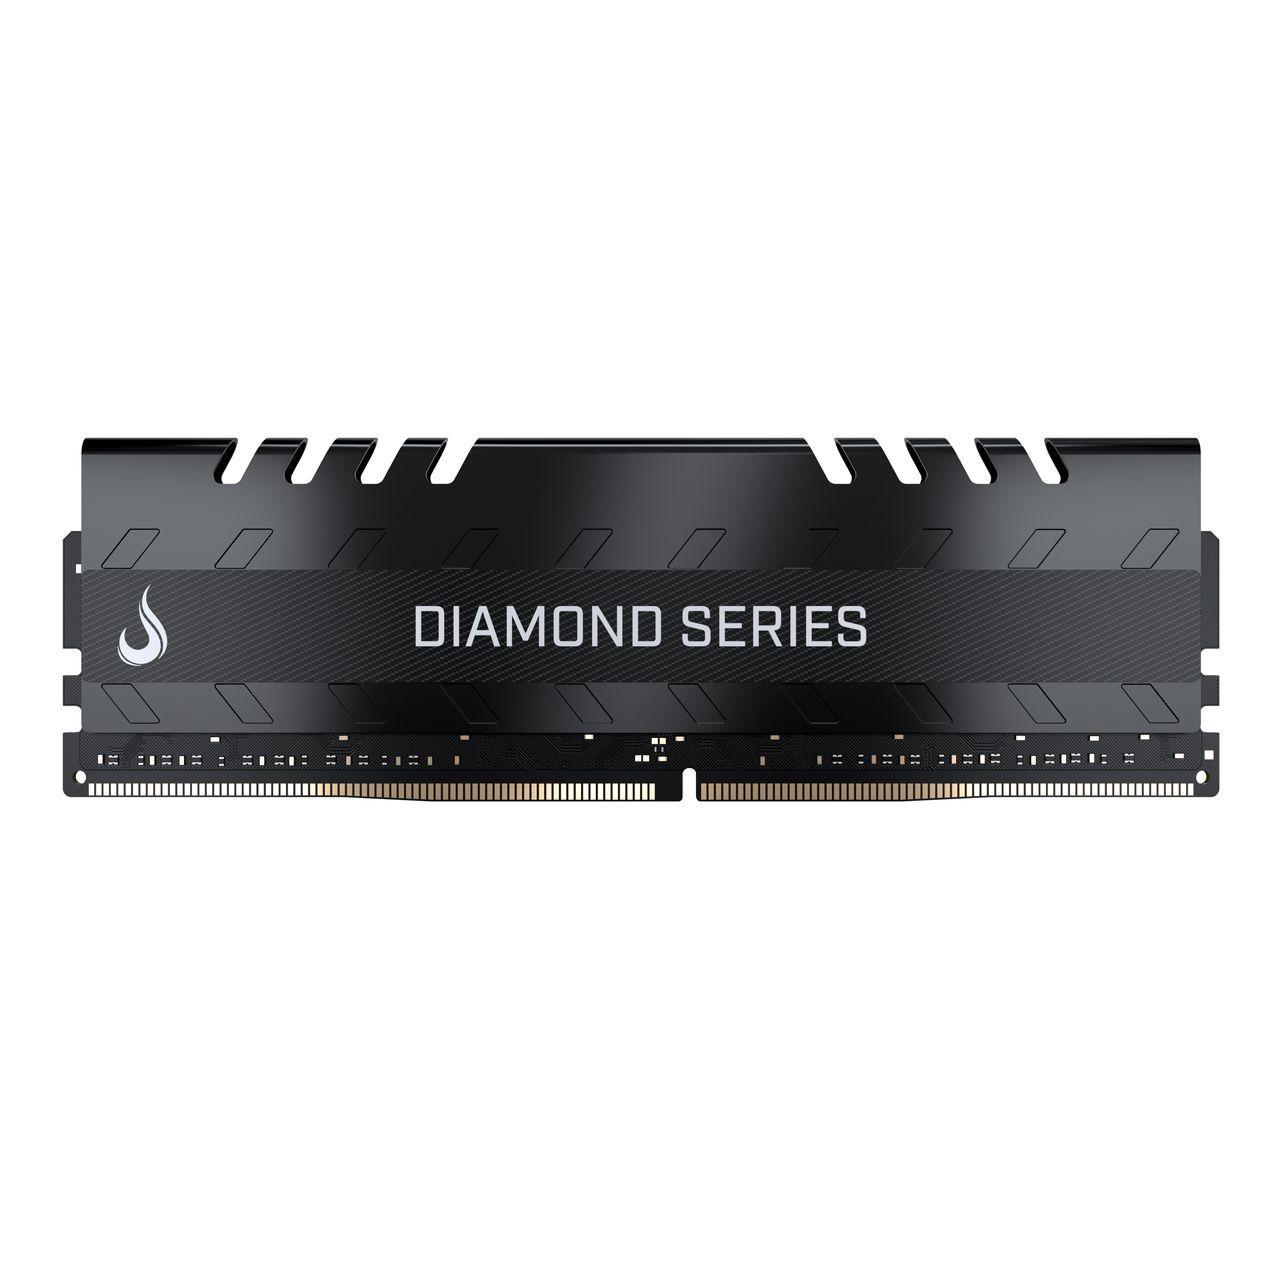 Memoria Ram DDR4 16GB 2400MHZ Diamond - RM-D4-16G-2400D BLACK